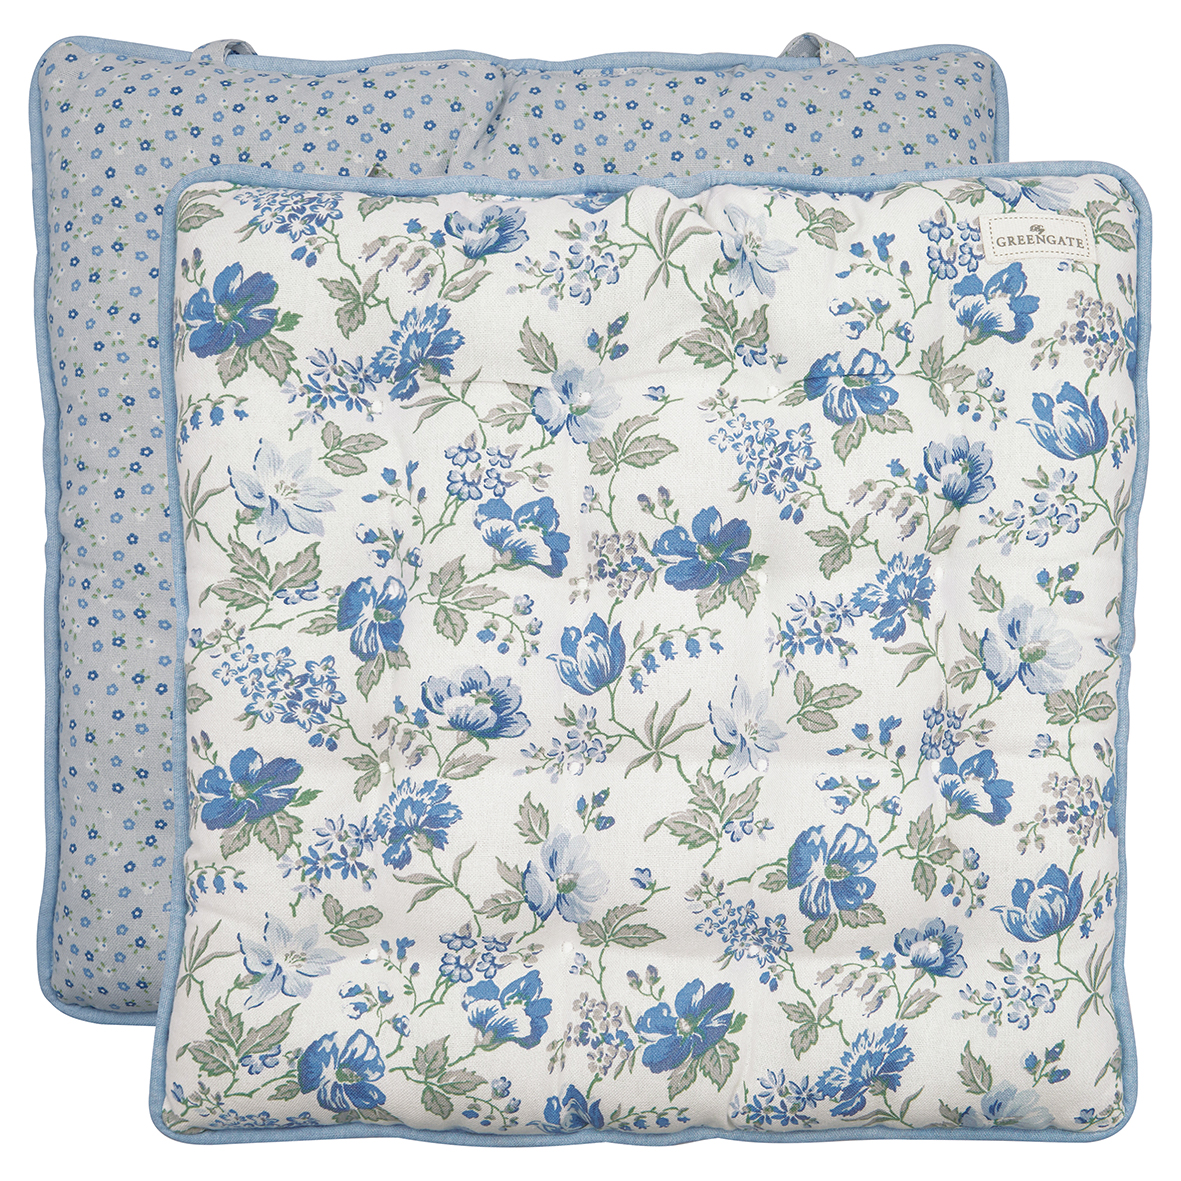 Greengate Sitzkissen Donna blue 40x40 cm